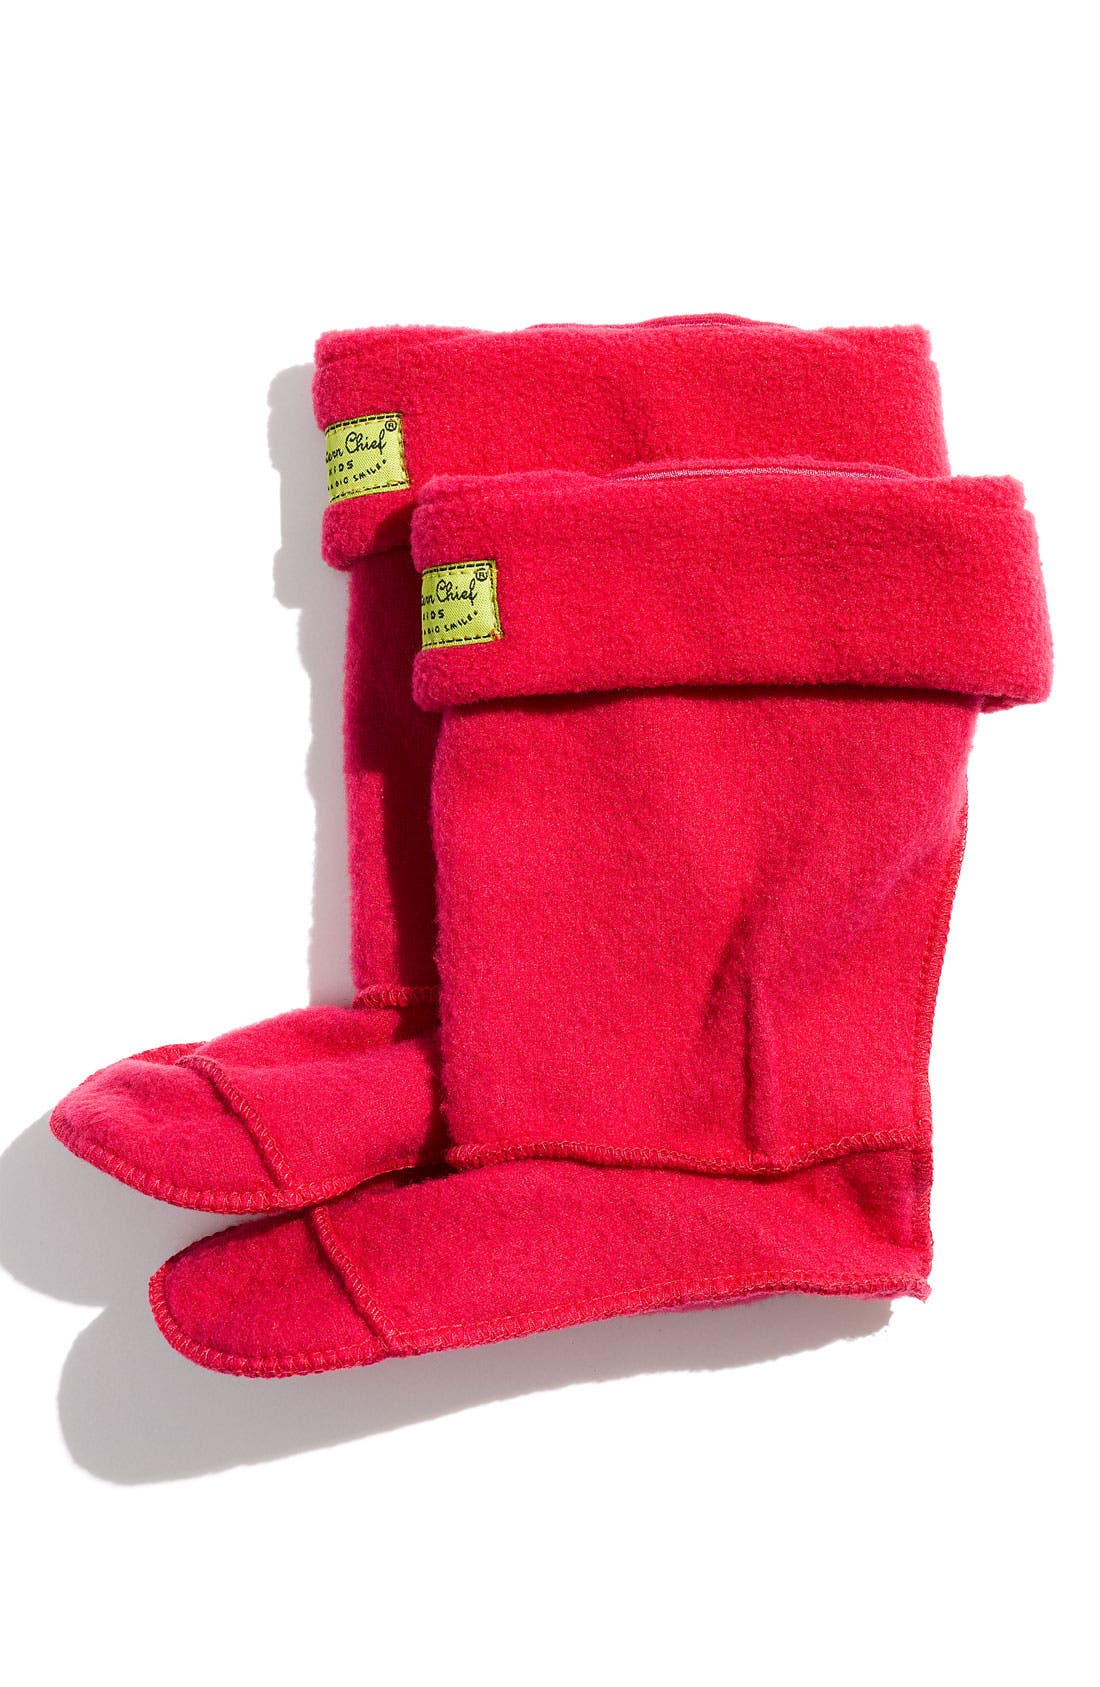 Main Image - Western Chief Fleece Boot Socks (Walker, Toddler & Little Kid)